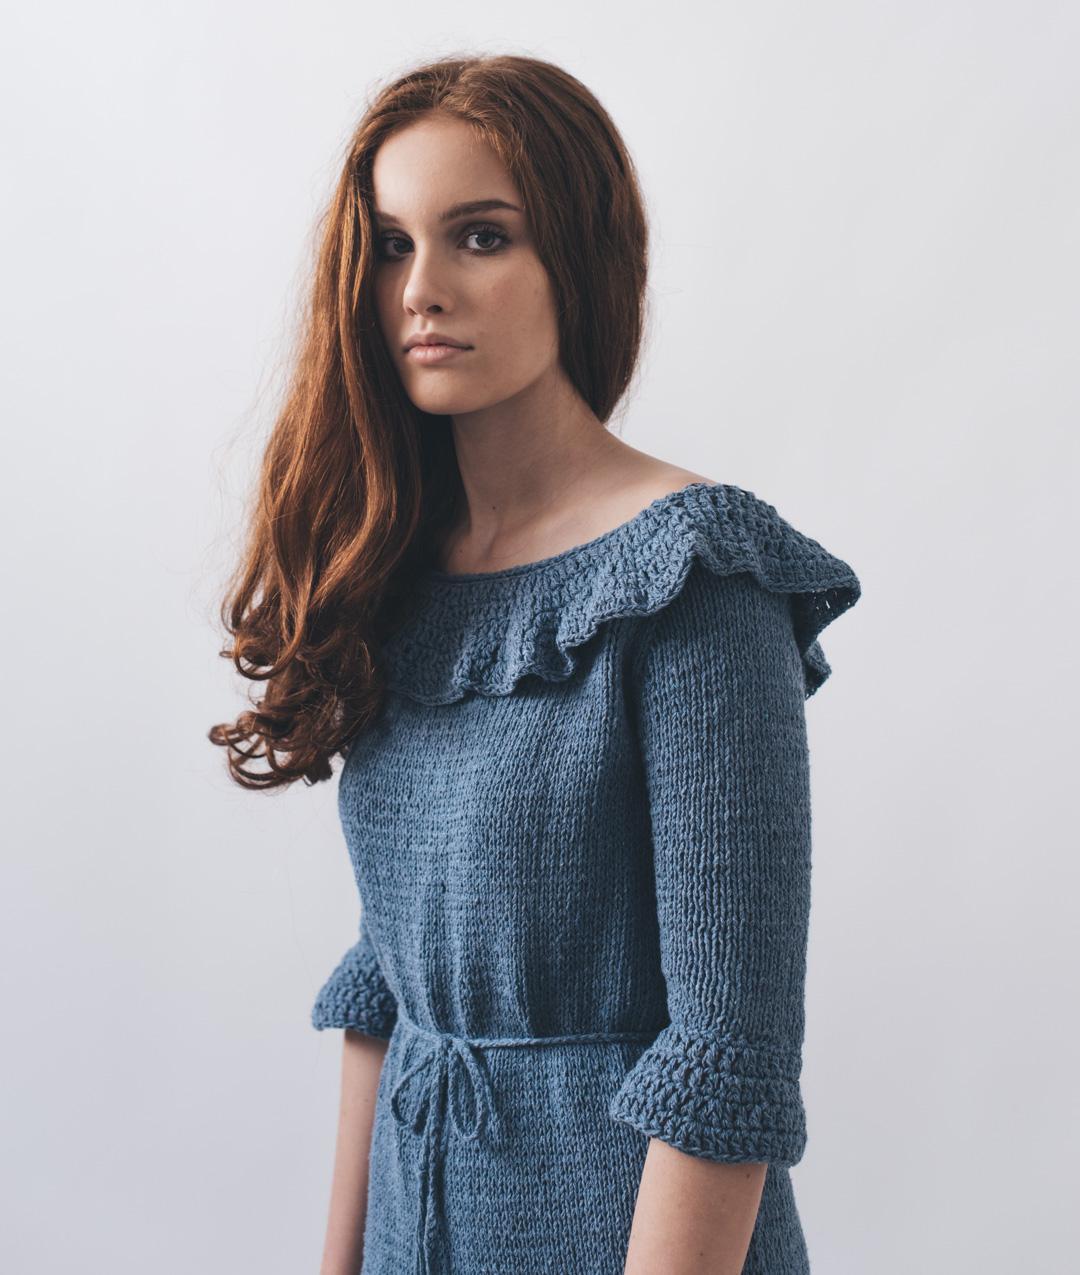 Dress - Cotton - Olivia Dress - Blue Shades - 1